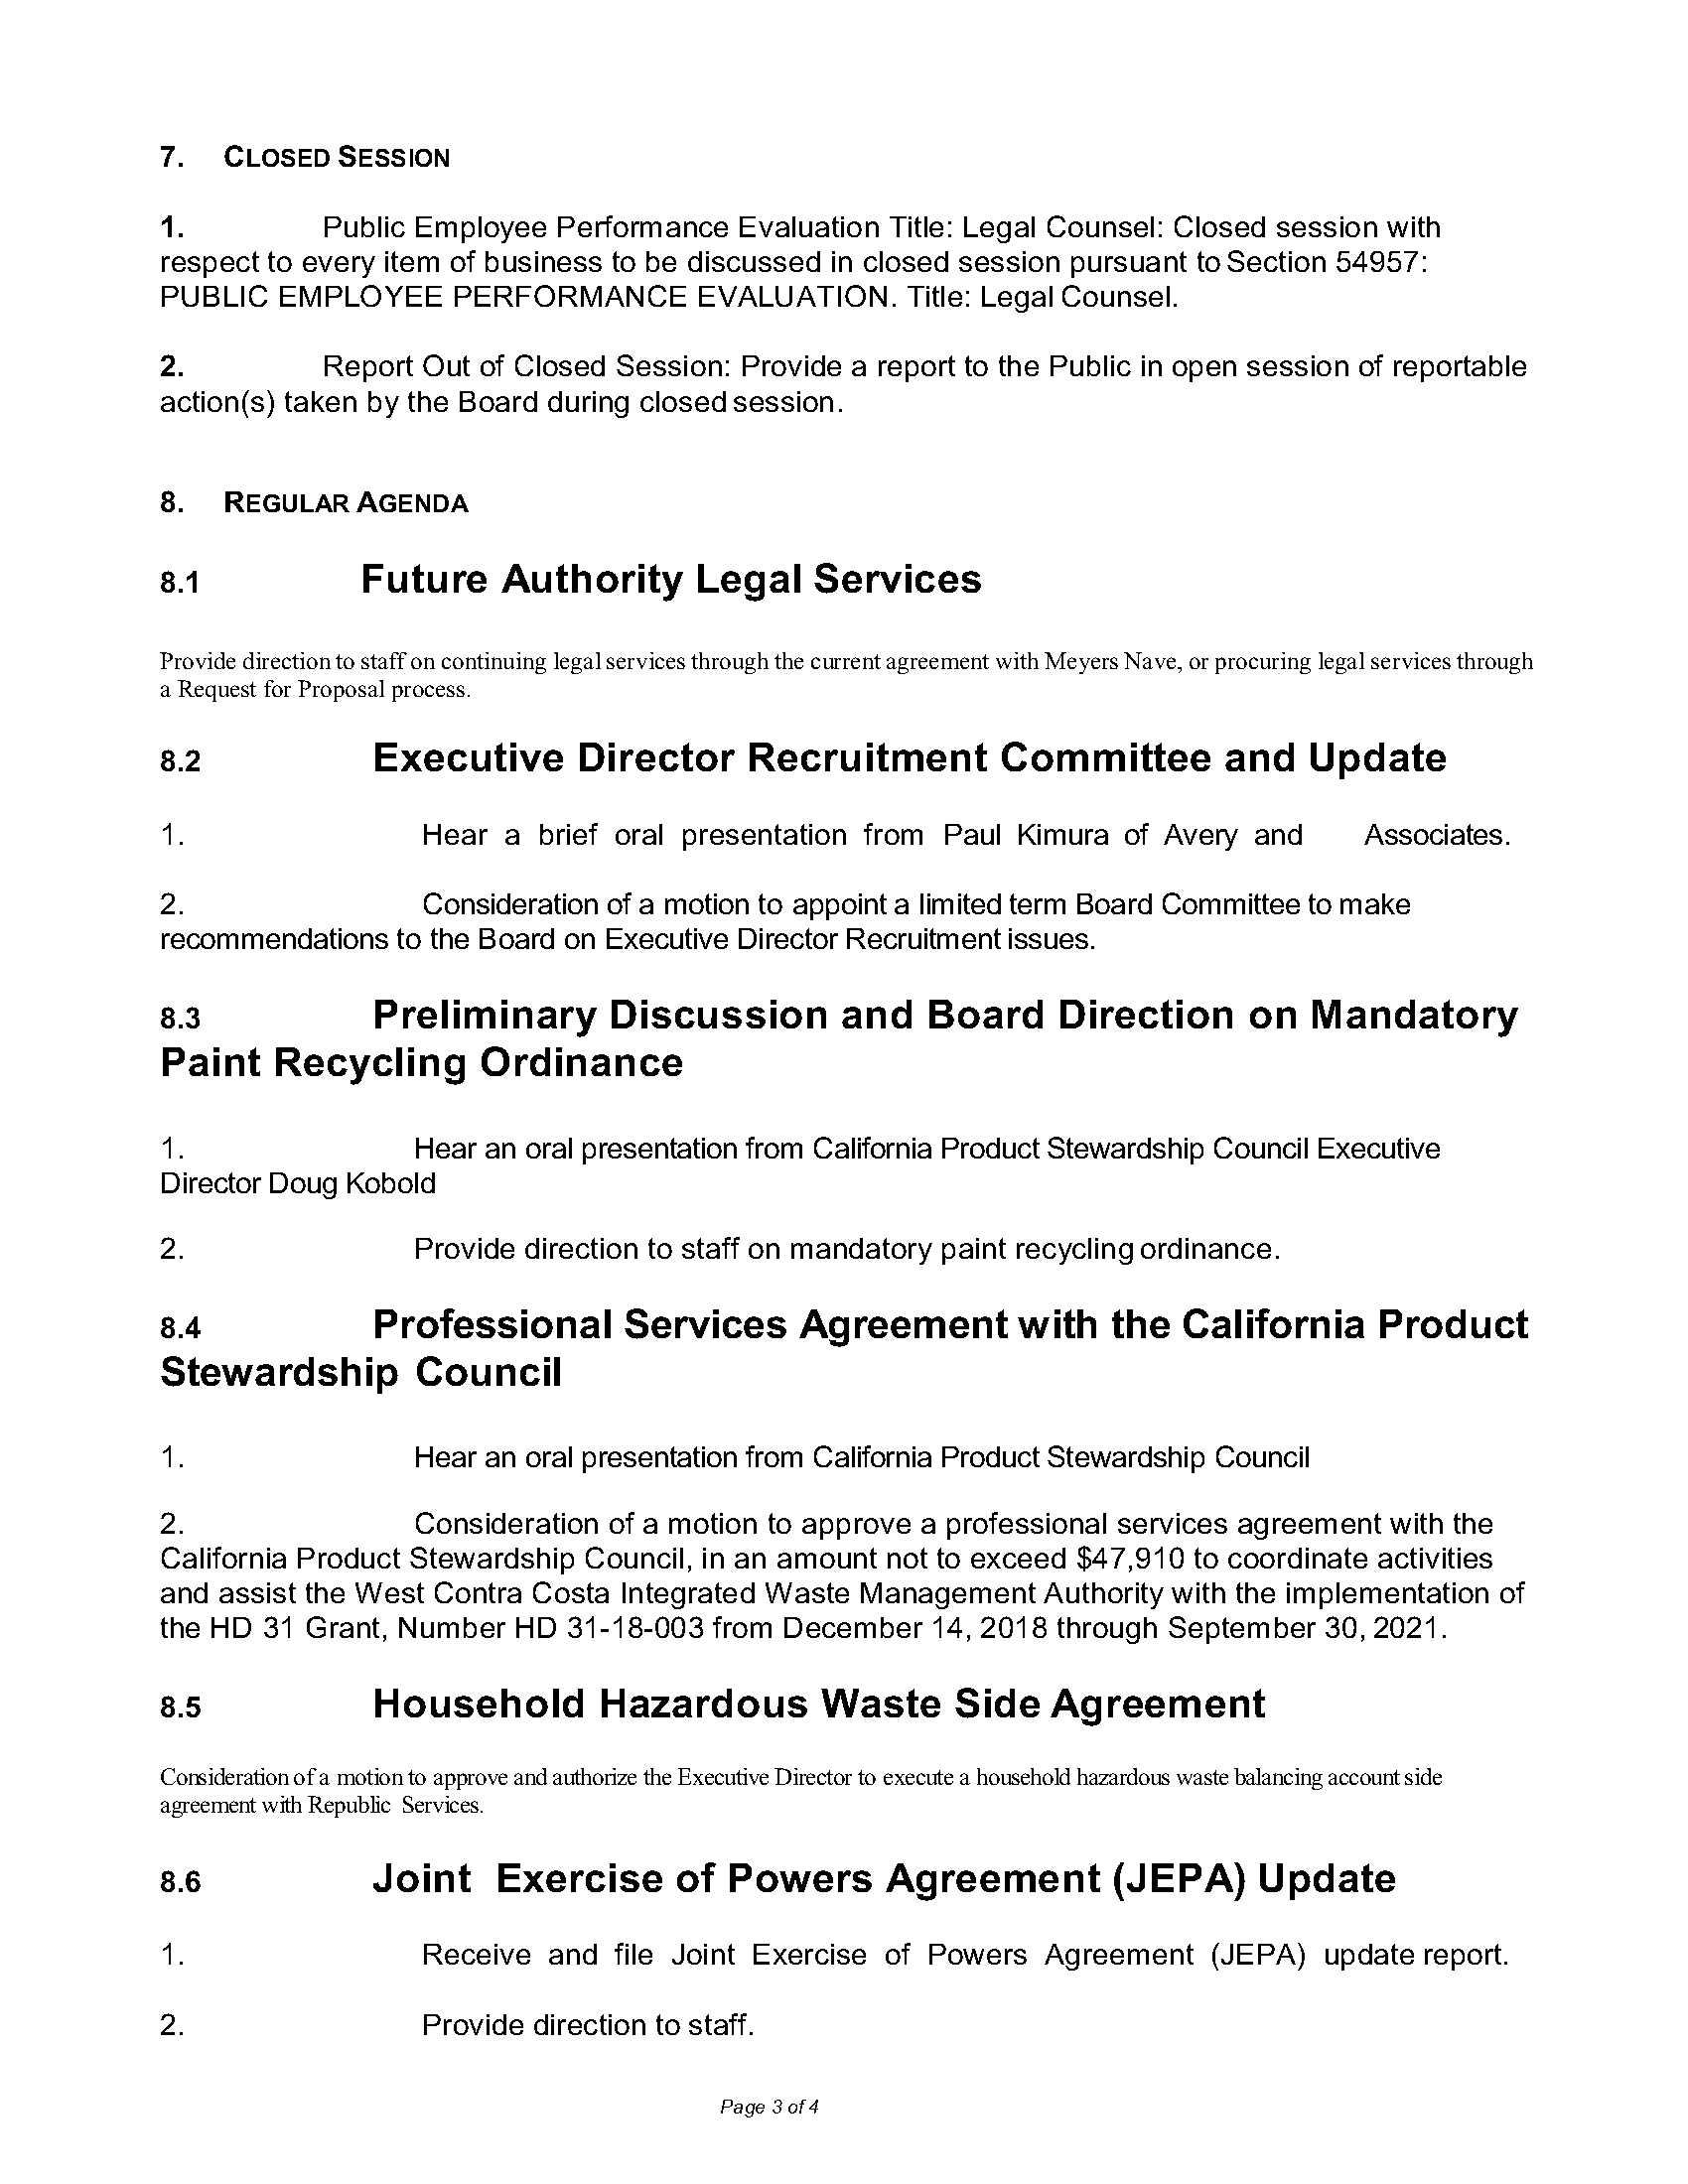 ESMAC Agenda 1.9.2019 (34 Pages)_18.jpg